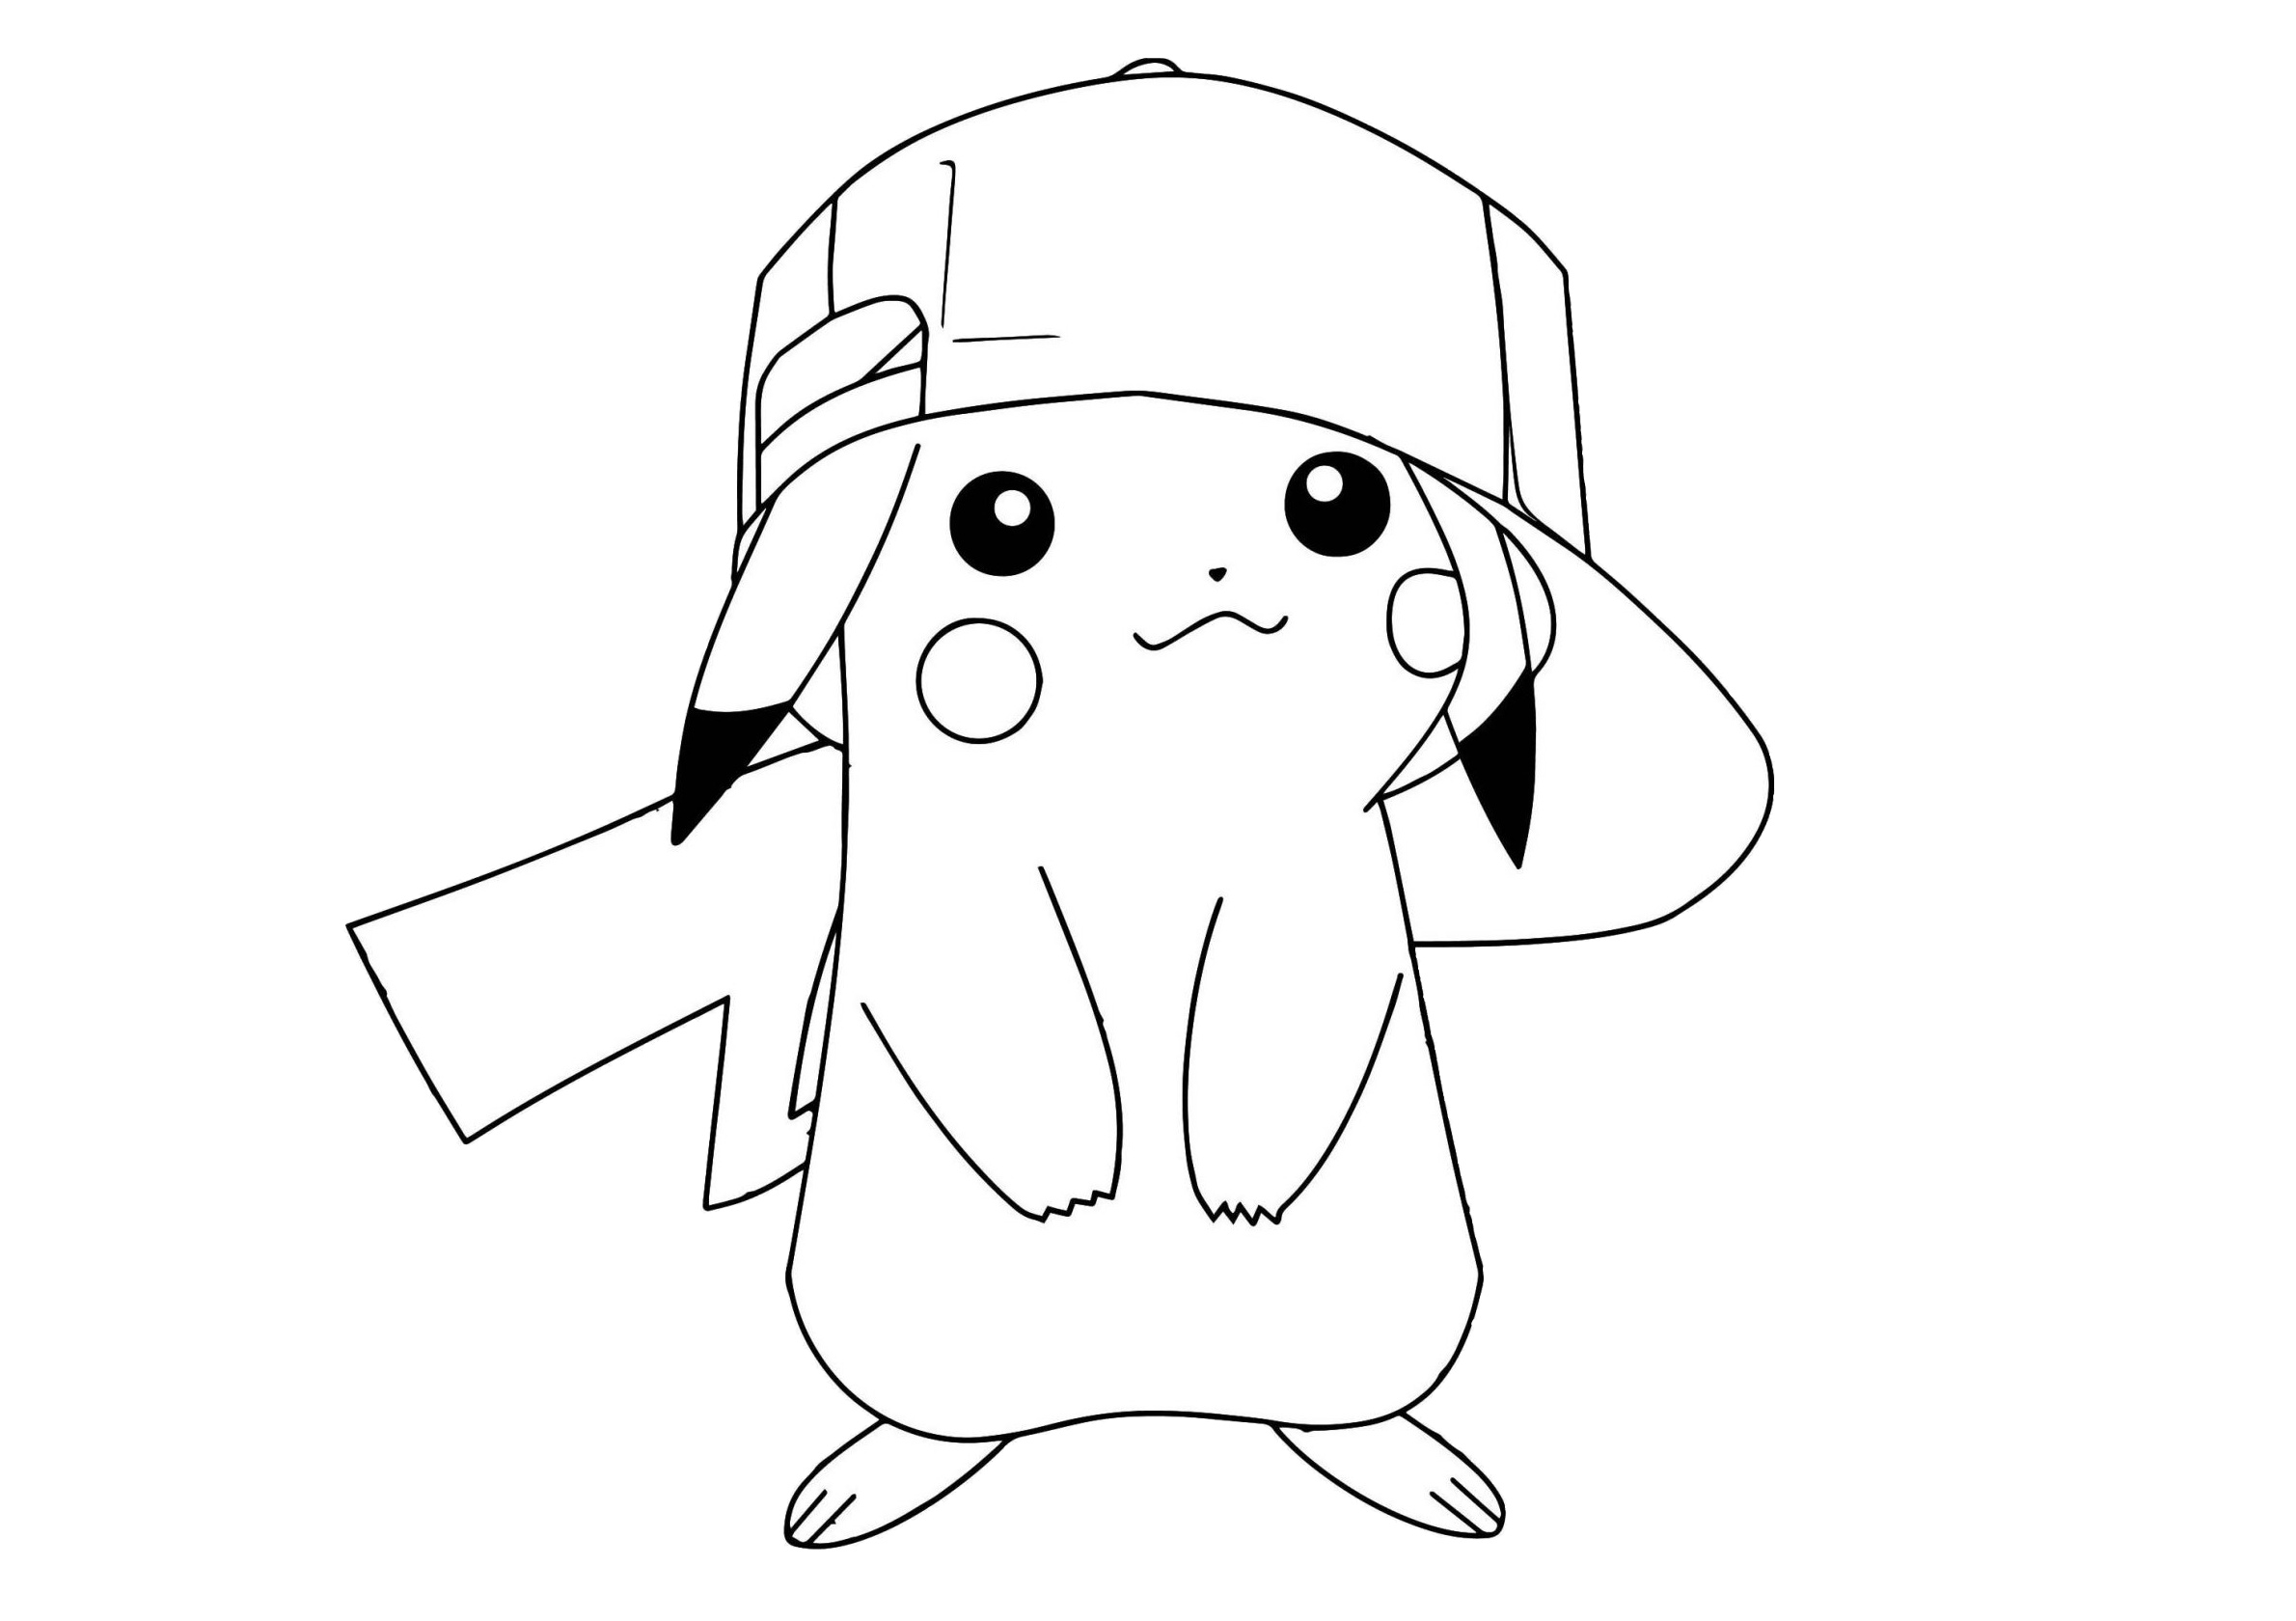 Cute Little Pikachu Pokemon Coloring Pages